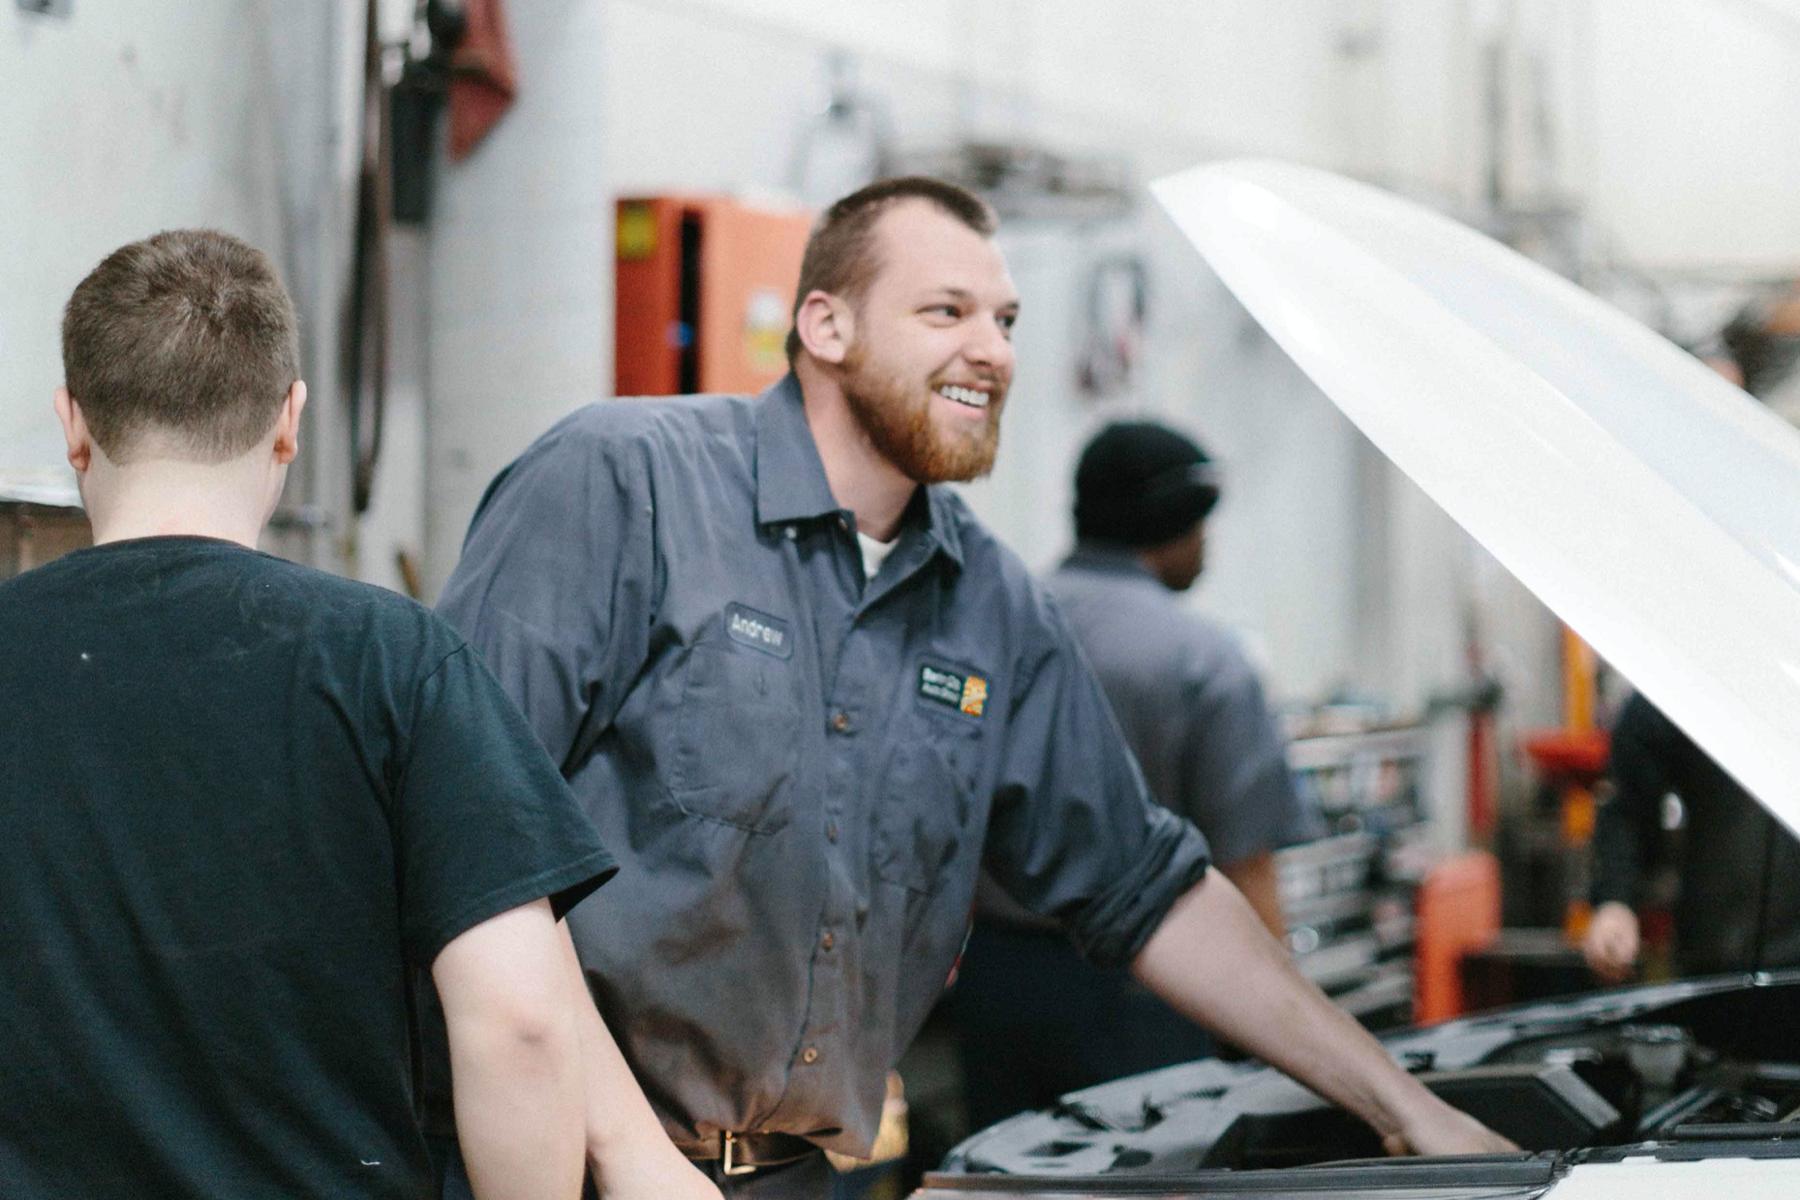 smiling service technician repairs car engine